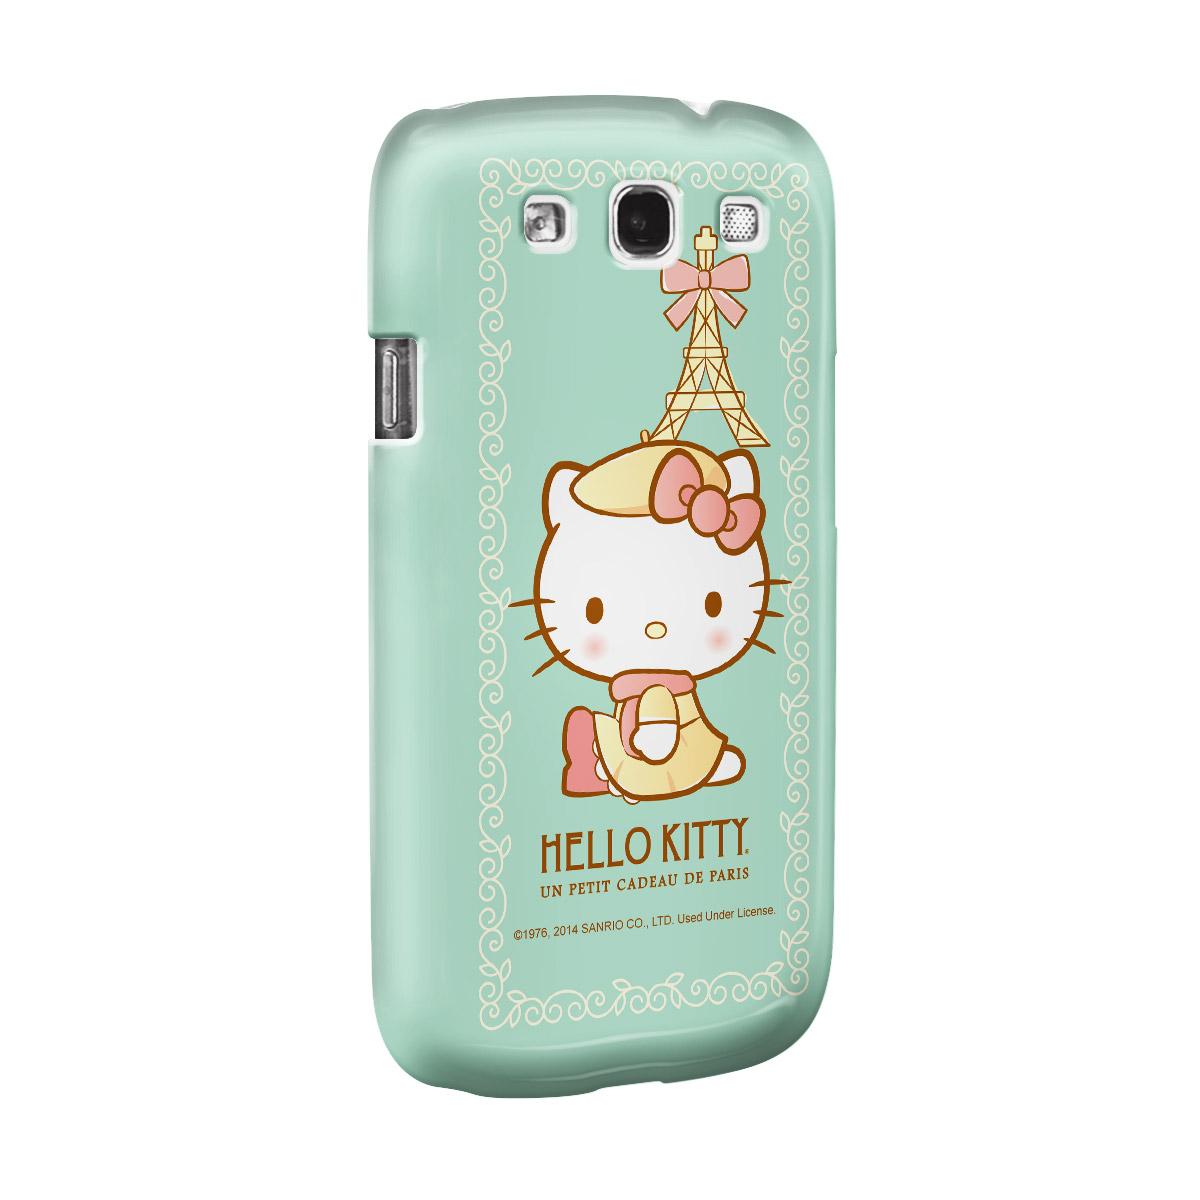 Capa de Celular Samsung S3 Hello Kitty Un Petit Cadeau